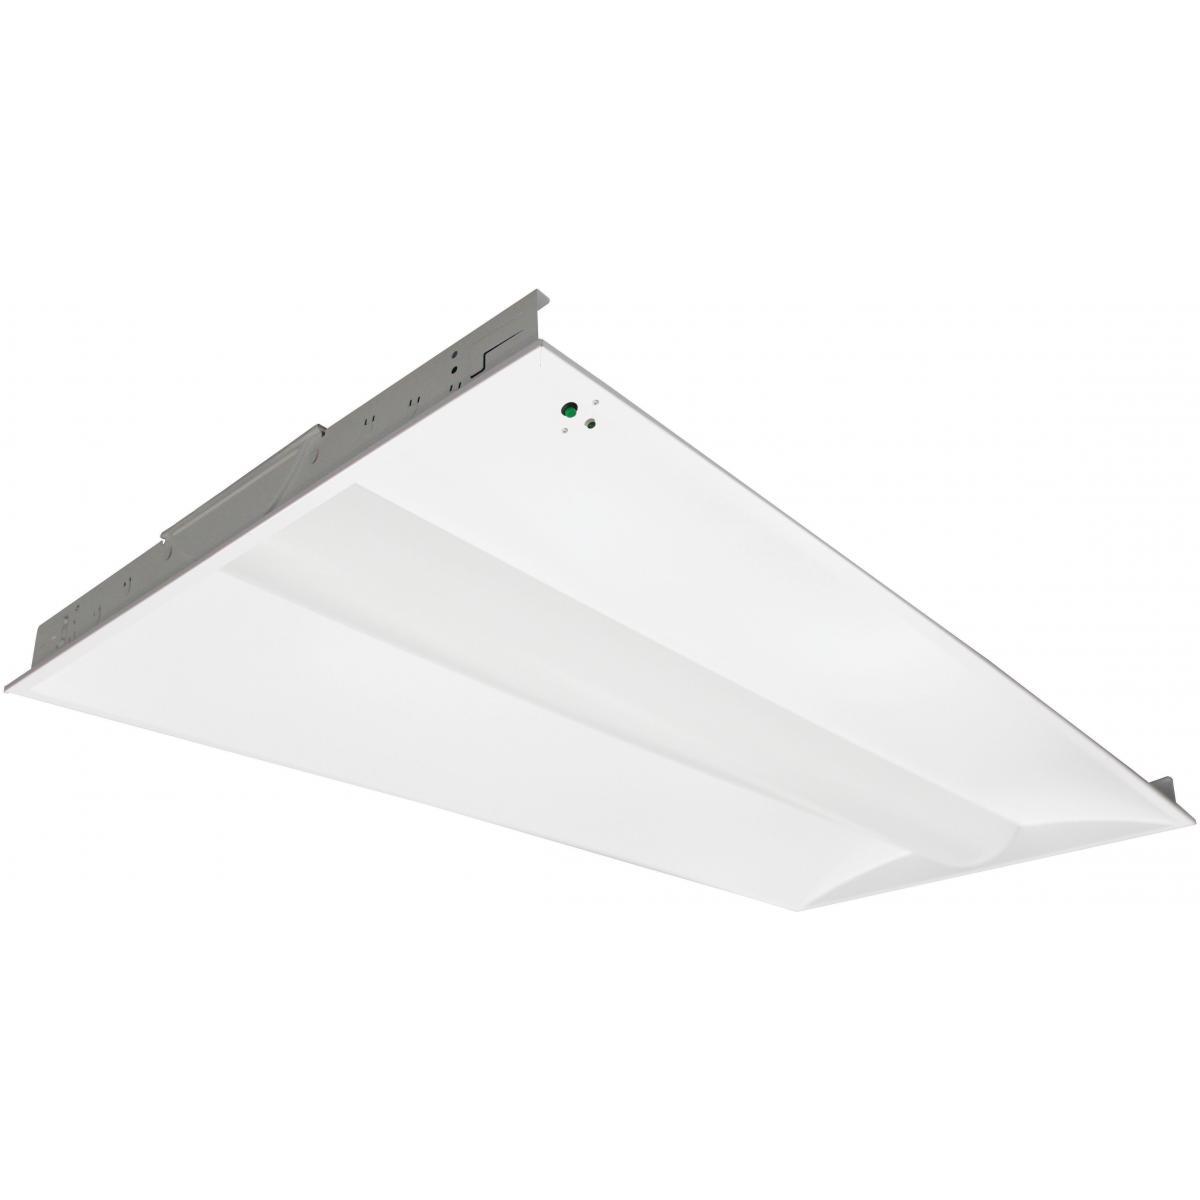 65-453 2FT X 4FT EM LED TROFFER 40W